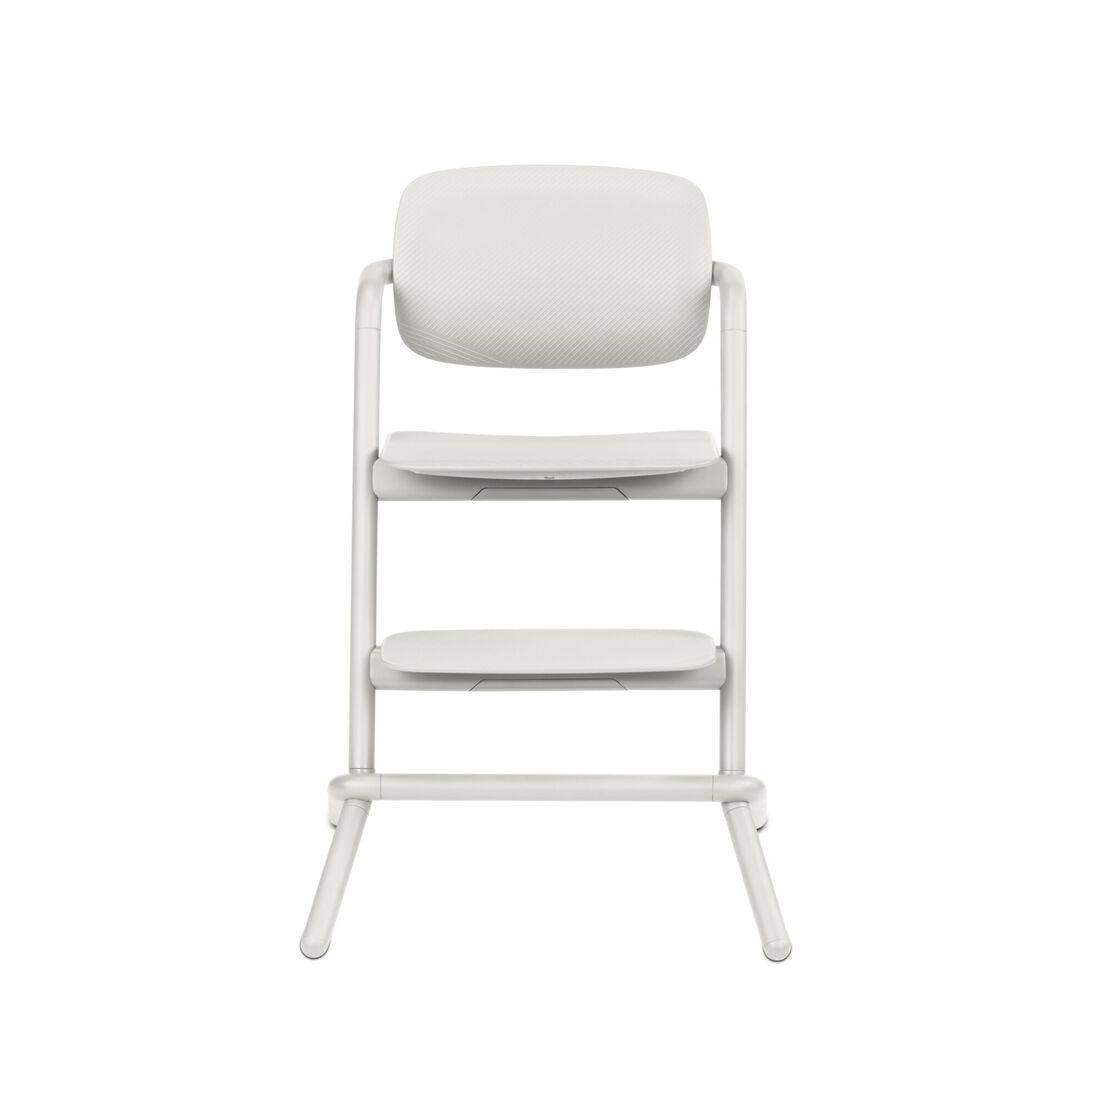 CYBEX Lemo Chair - Porcelaine White (Plastic) in Porcelaine White (Plastic) large image number 2